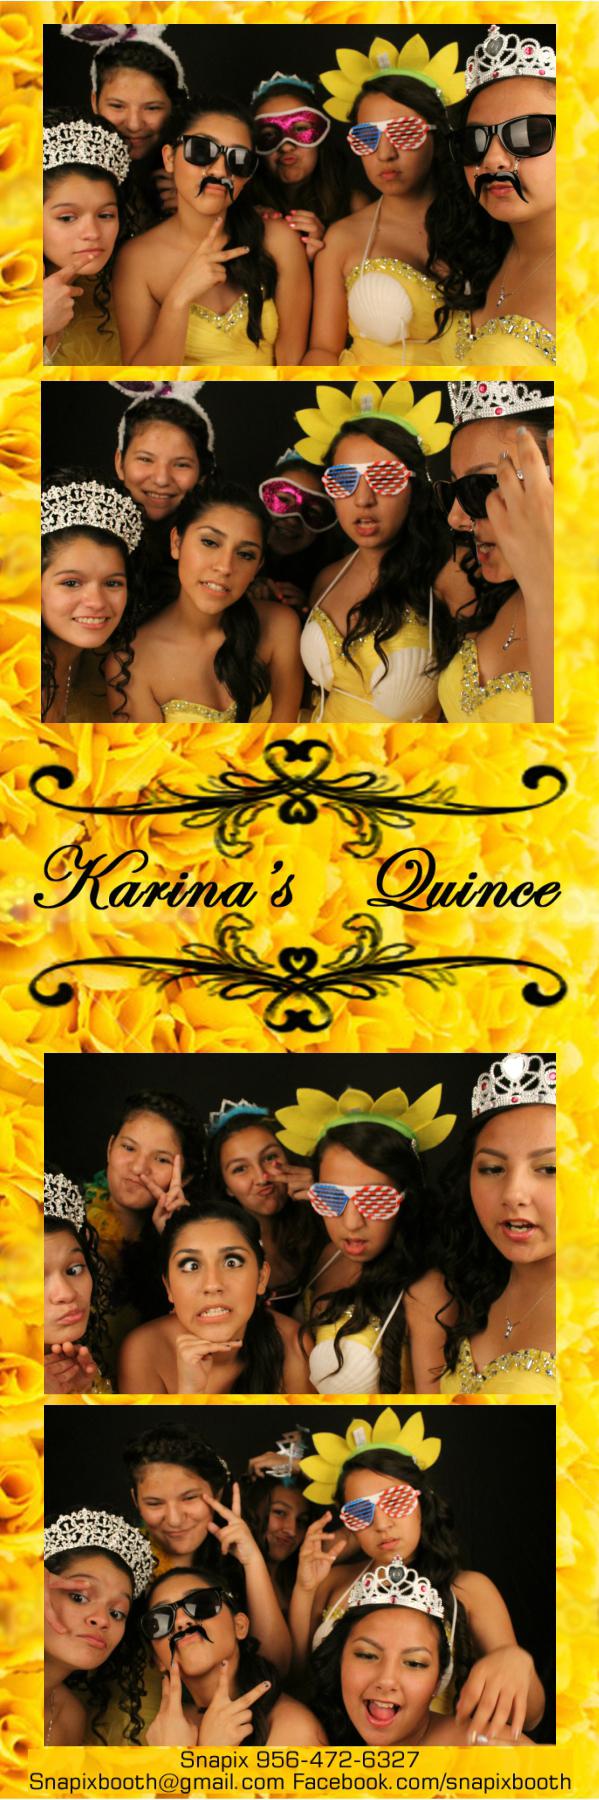 Karina's Quince.JPG